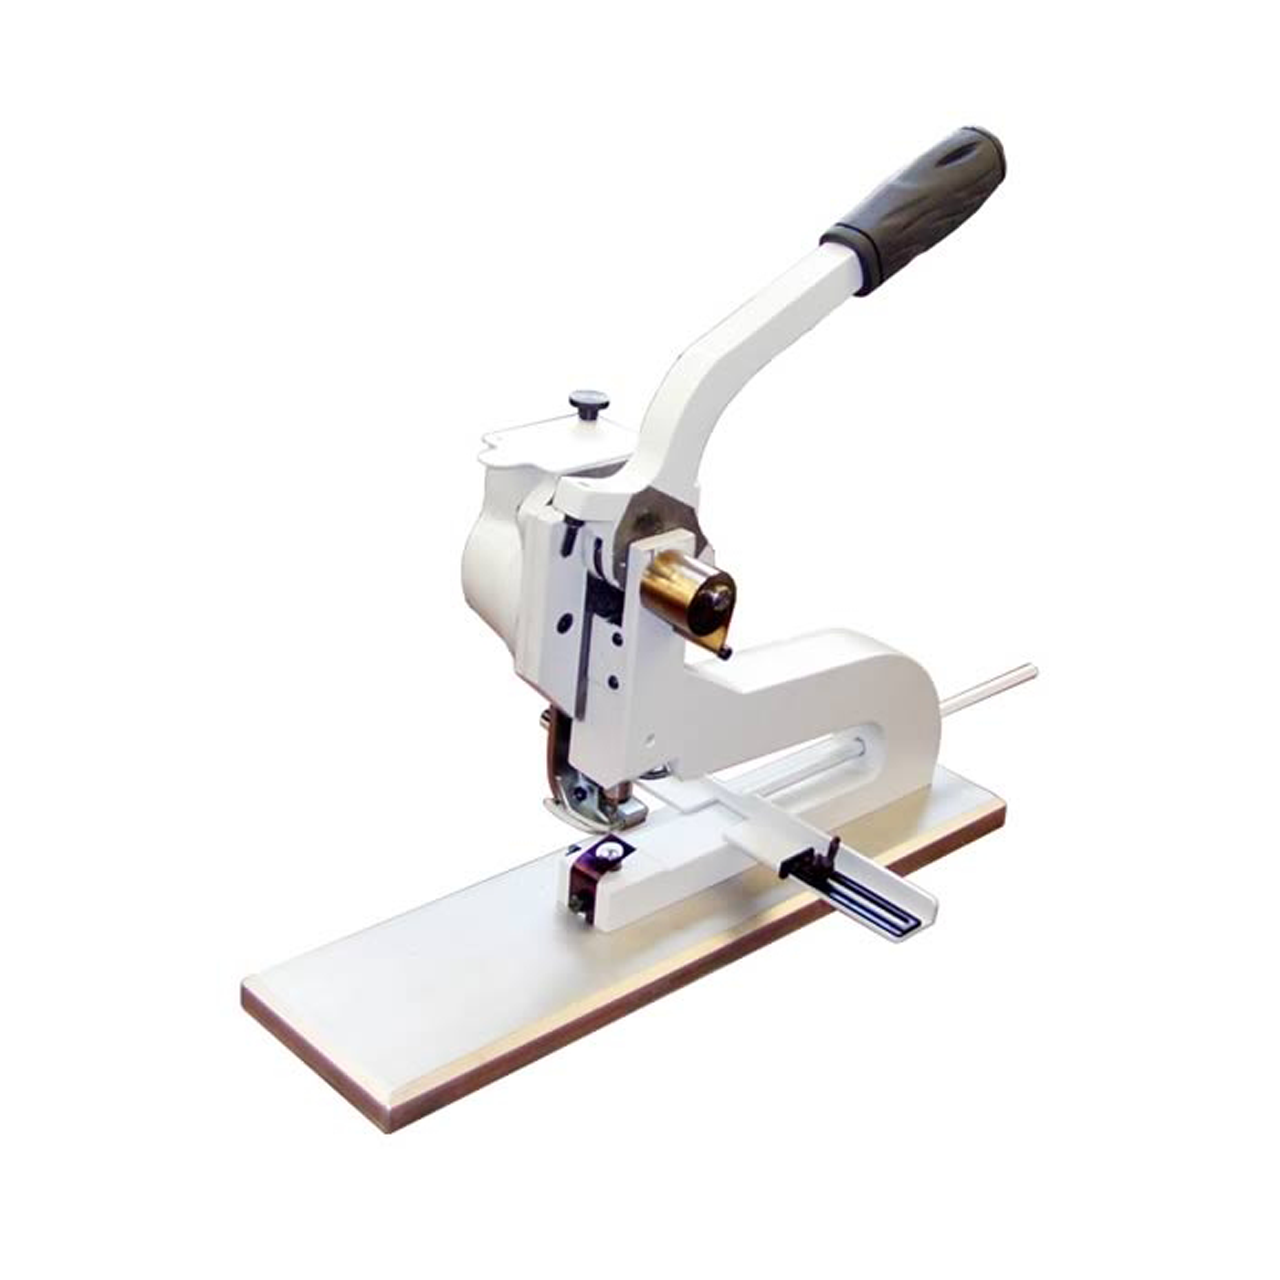 Ösmaschine Hang Piccolo Modell 101-70